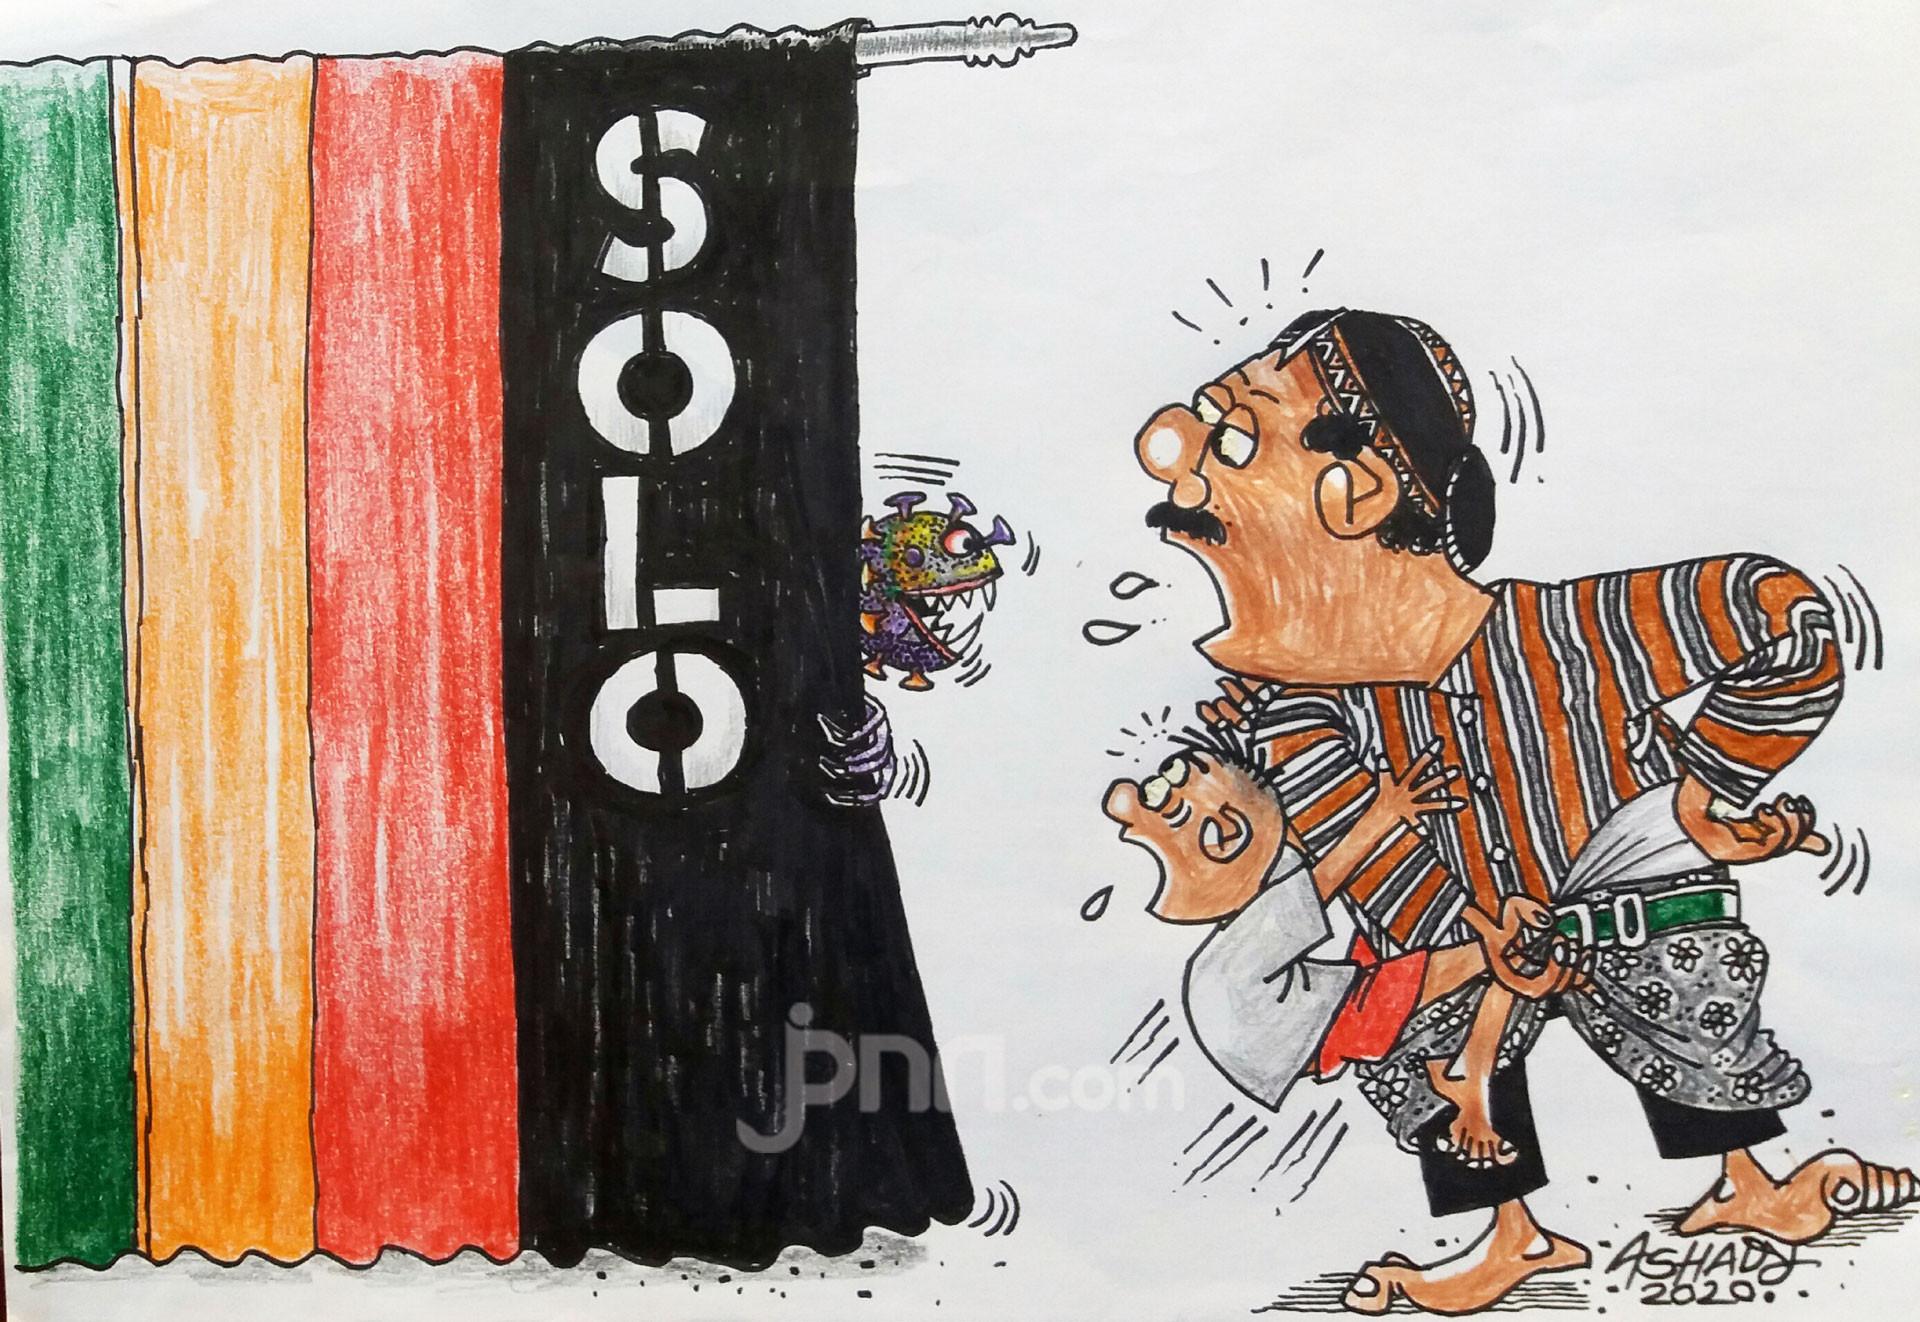 Solo Zona Hitam. Karikatur oleh Ashady - JPNN.com